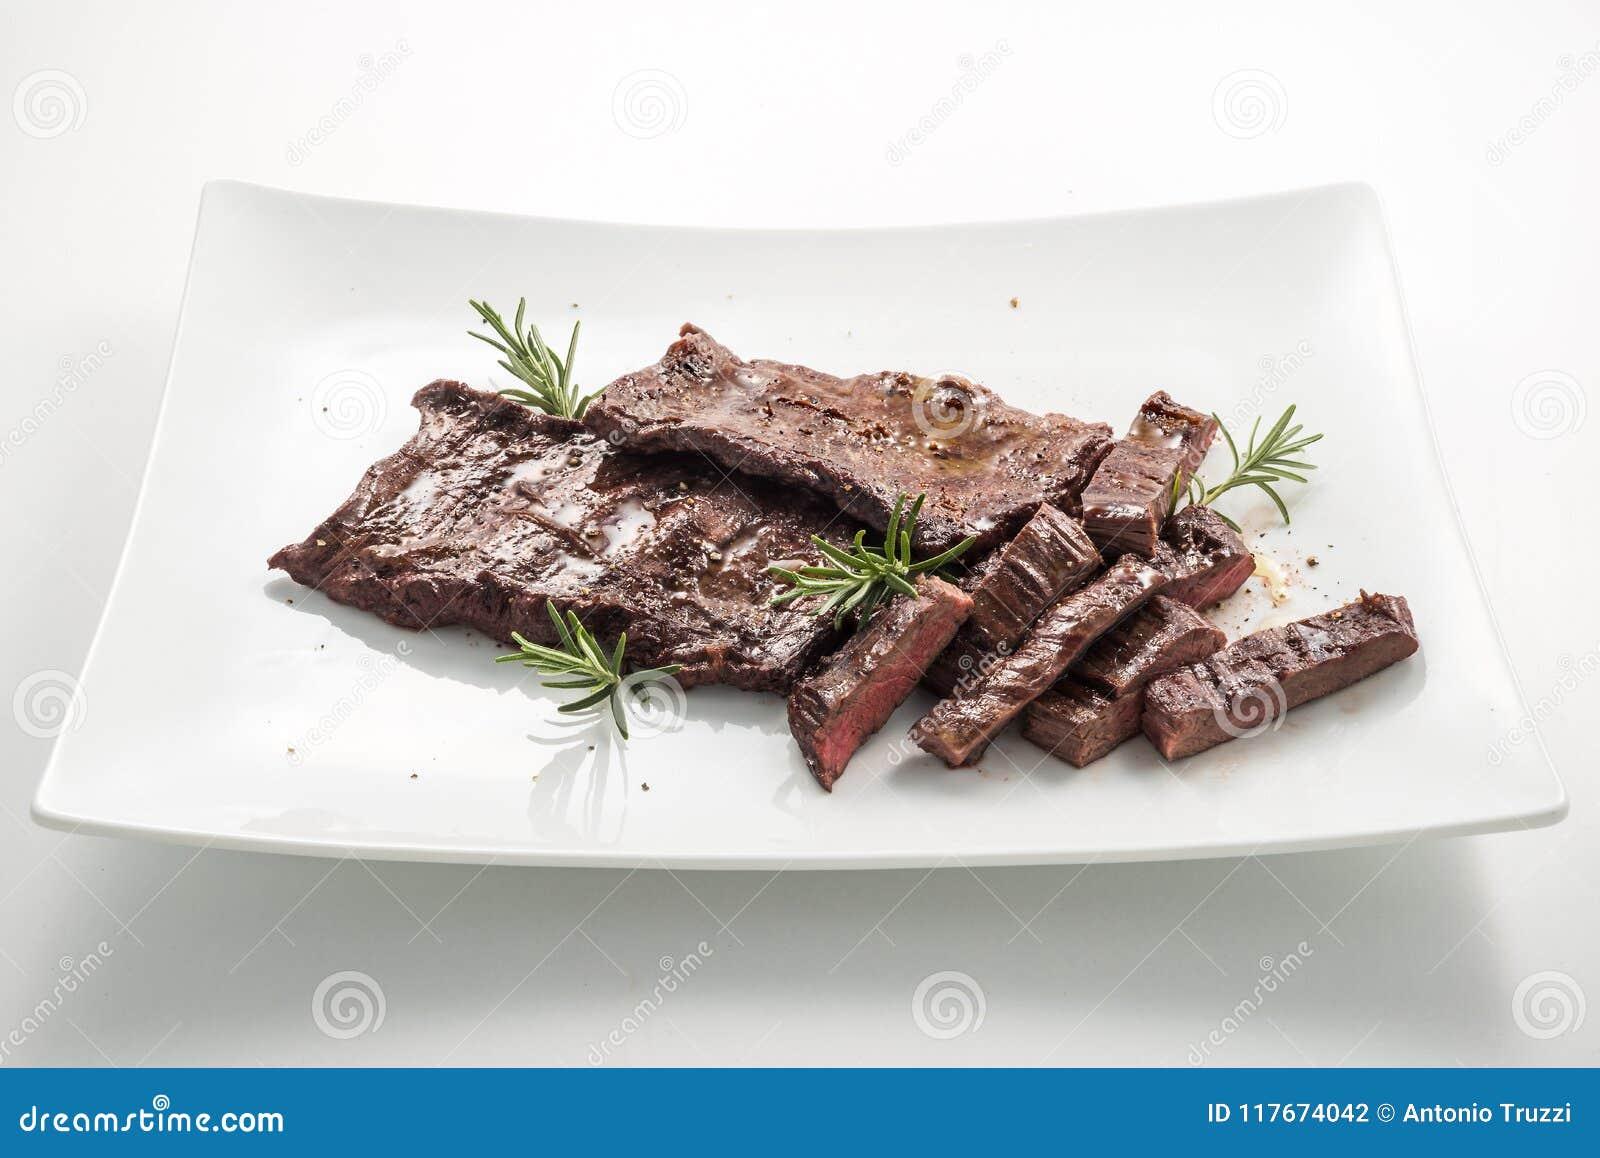 Meat Dish Skirt Steak Stock Photo Image Of Dish Flank 117674042